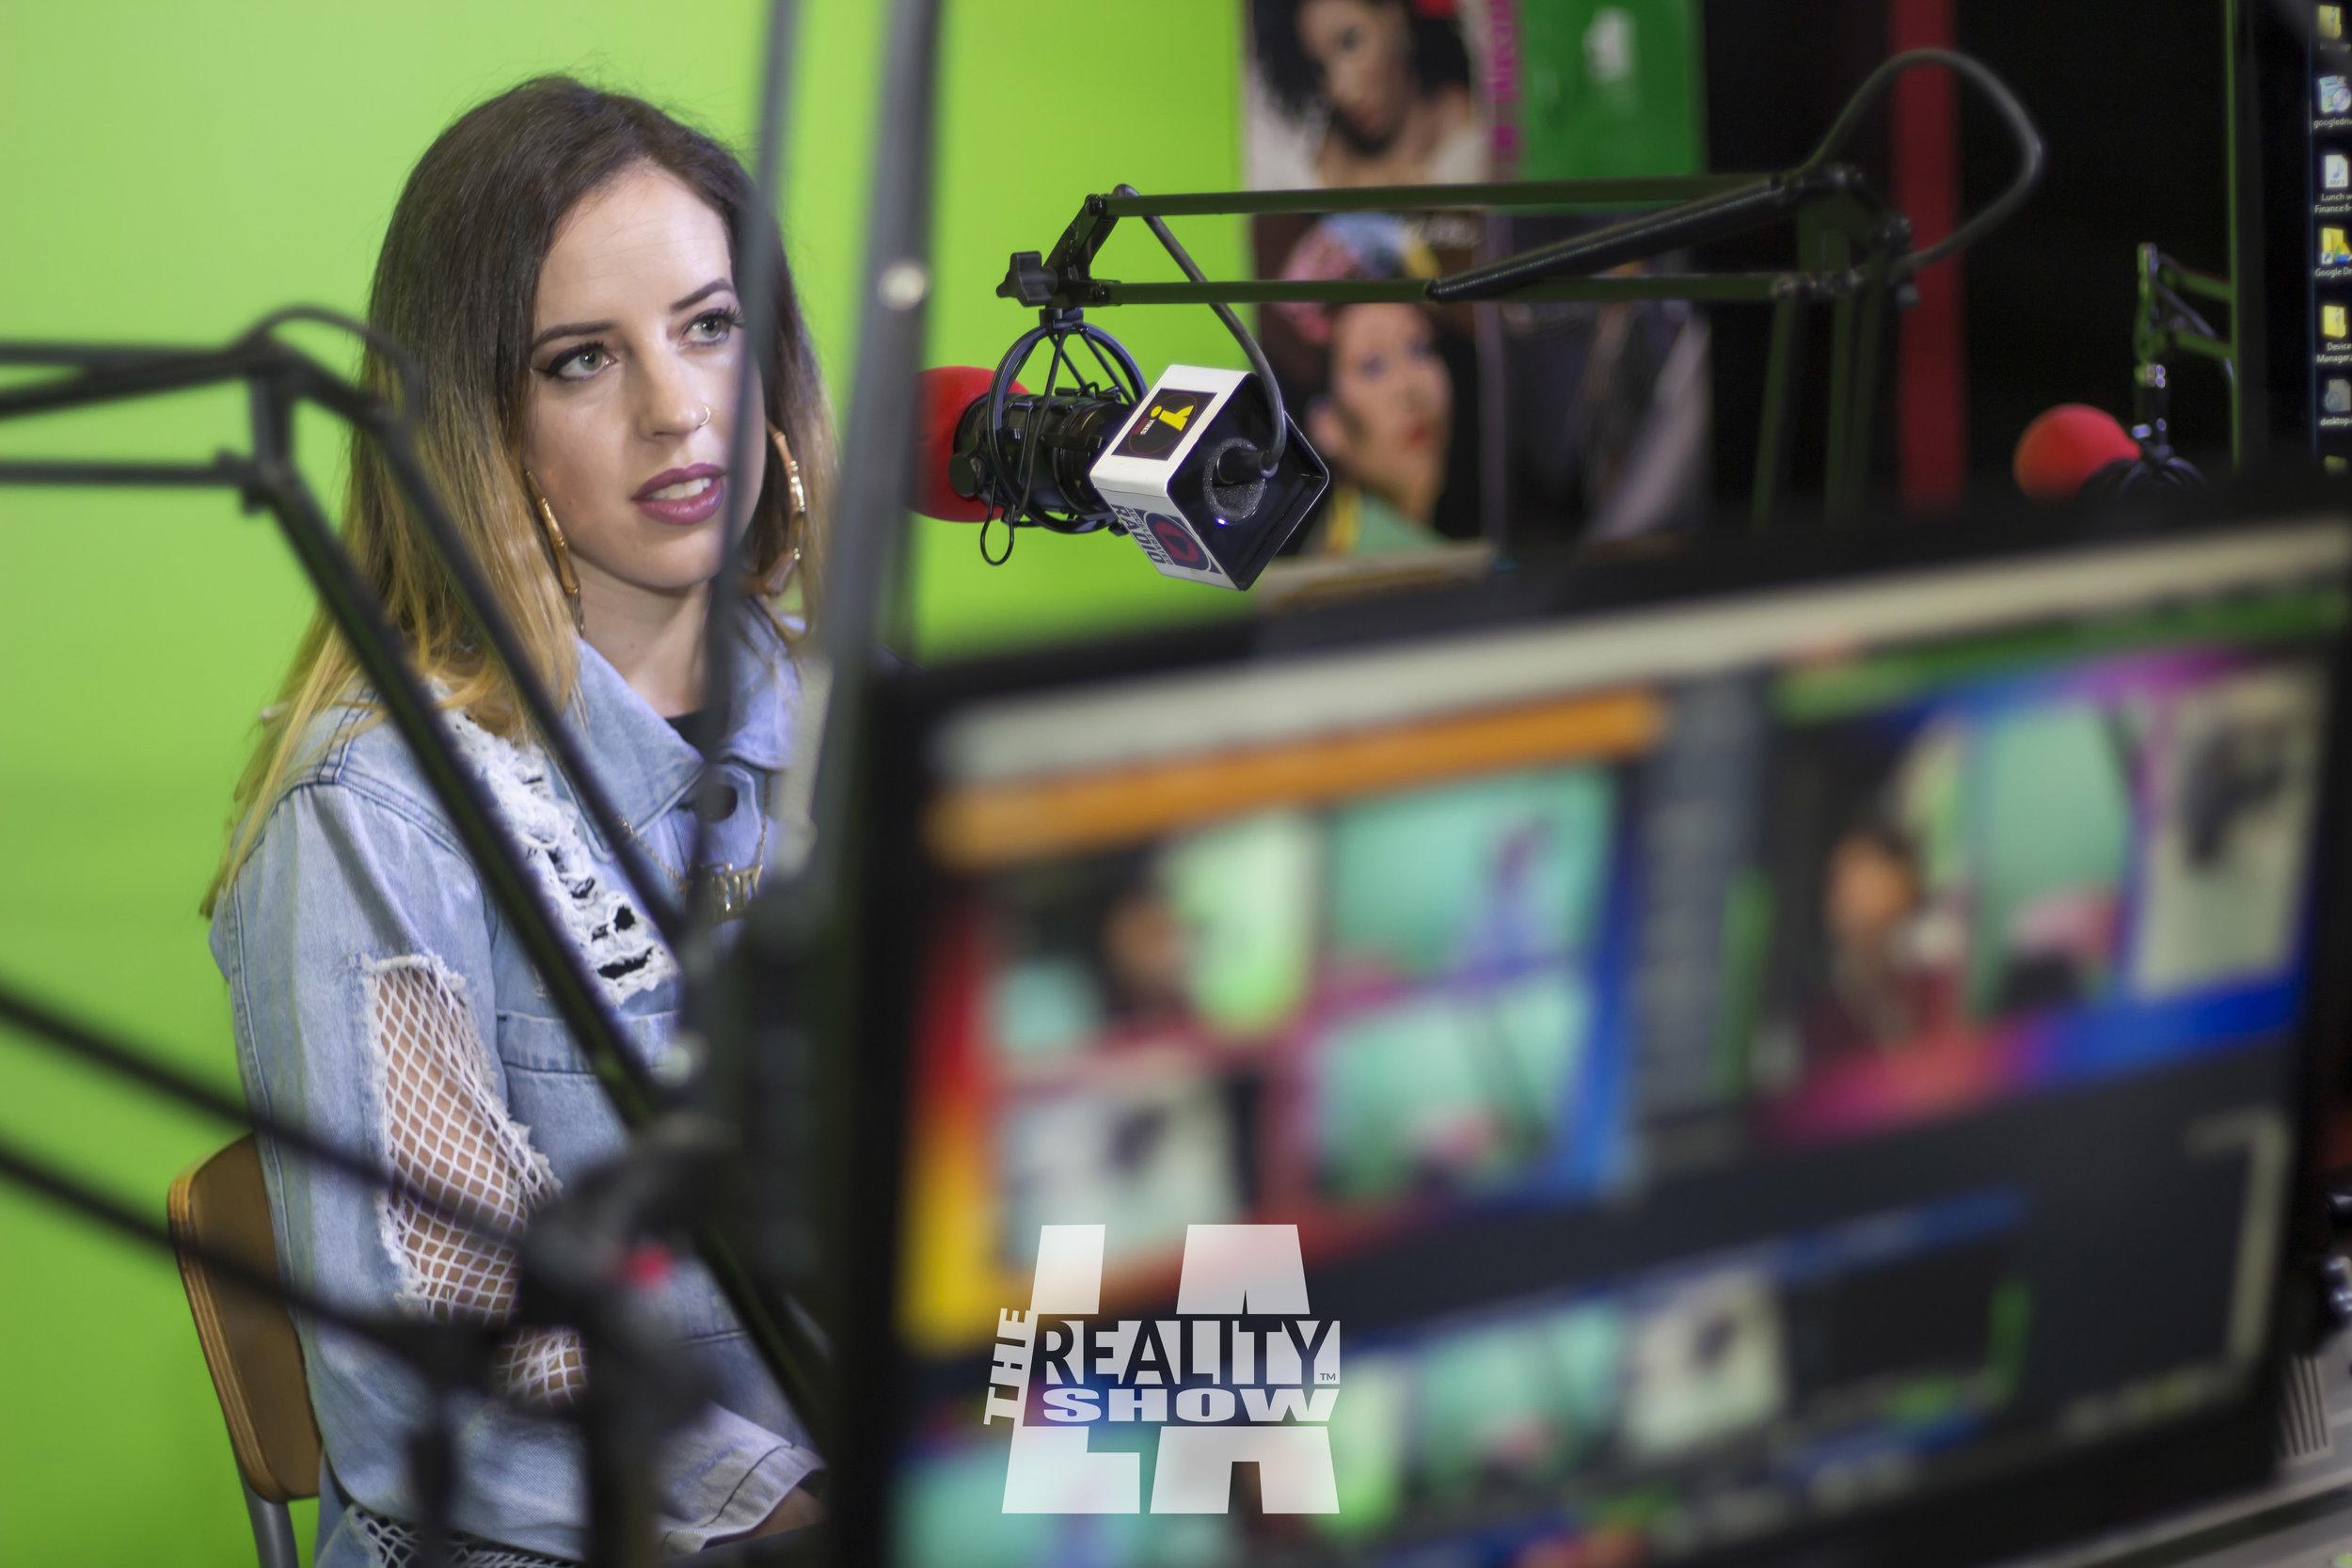 The Reality Show LA - Lihot - 11-14-17_26.jpg